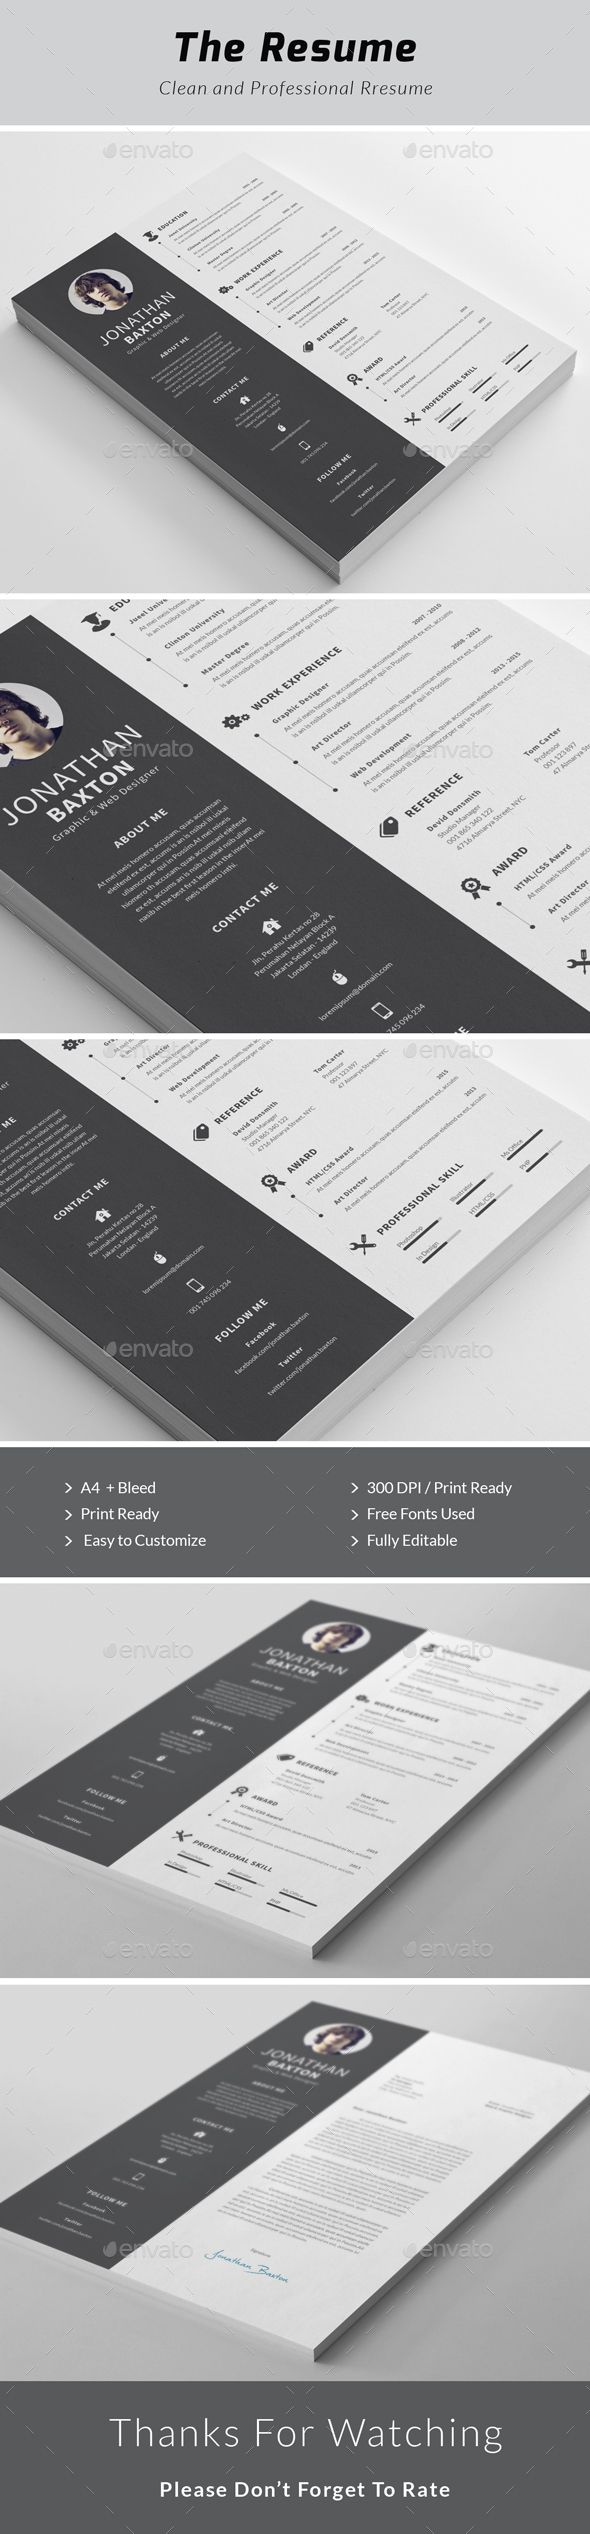 57 best print cv resume images on pinterest cv design design